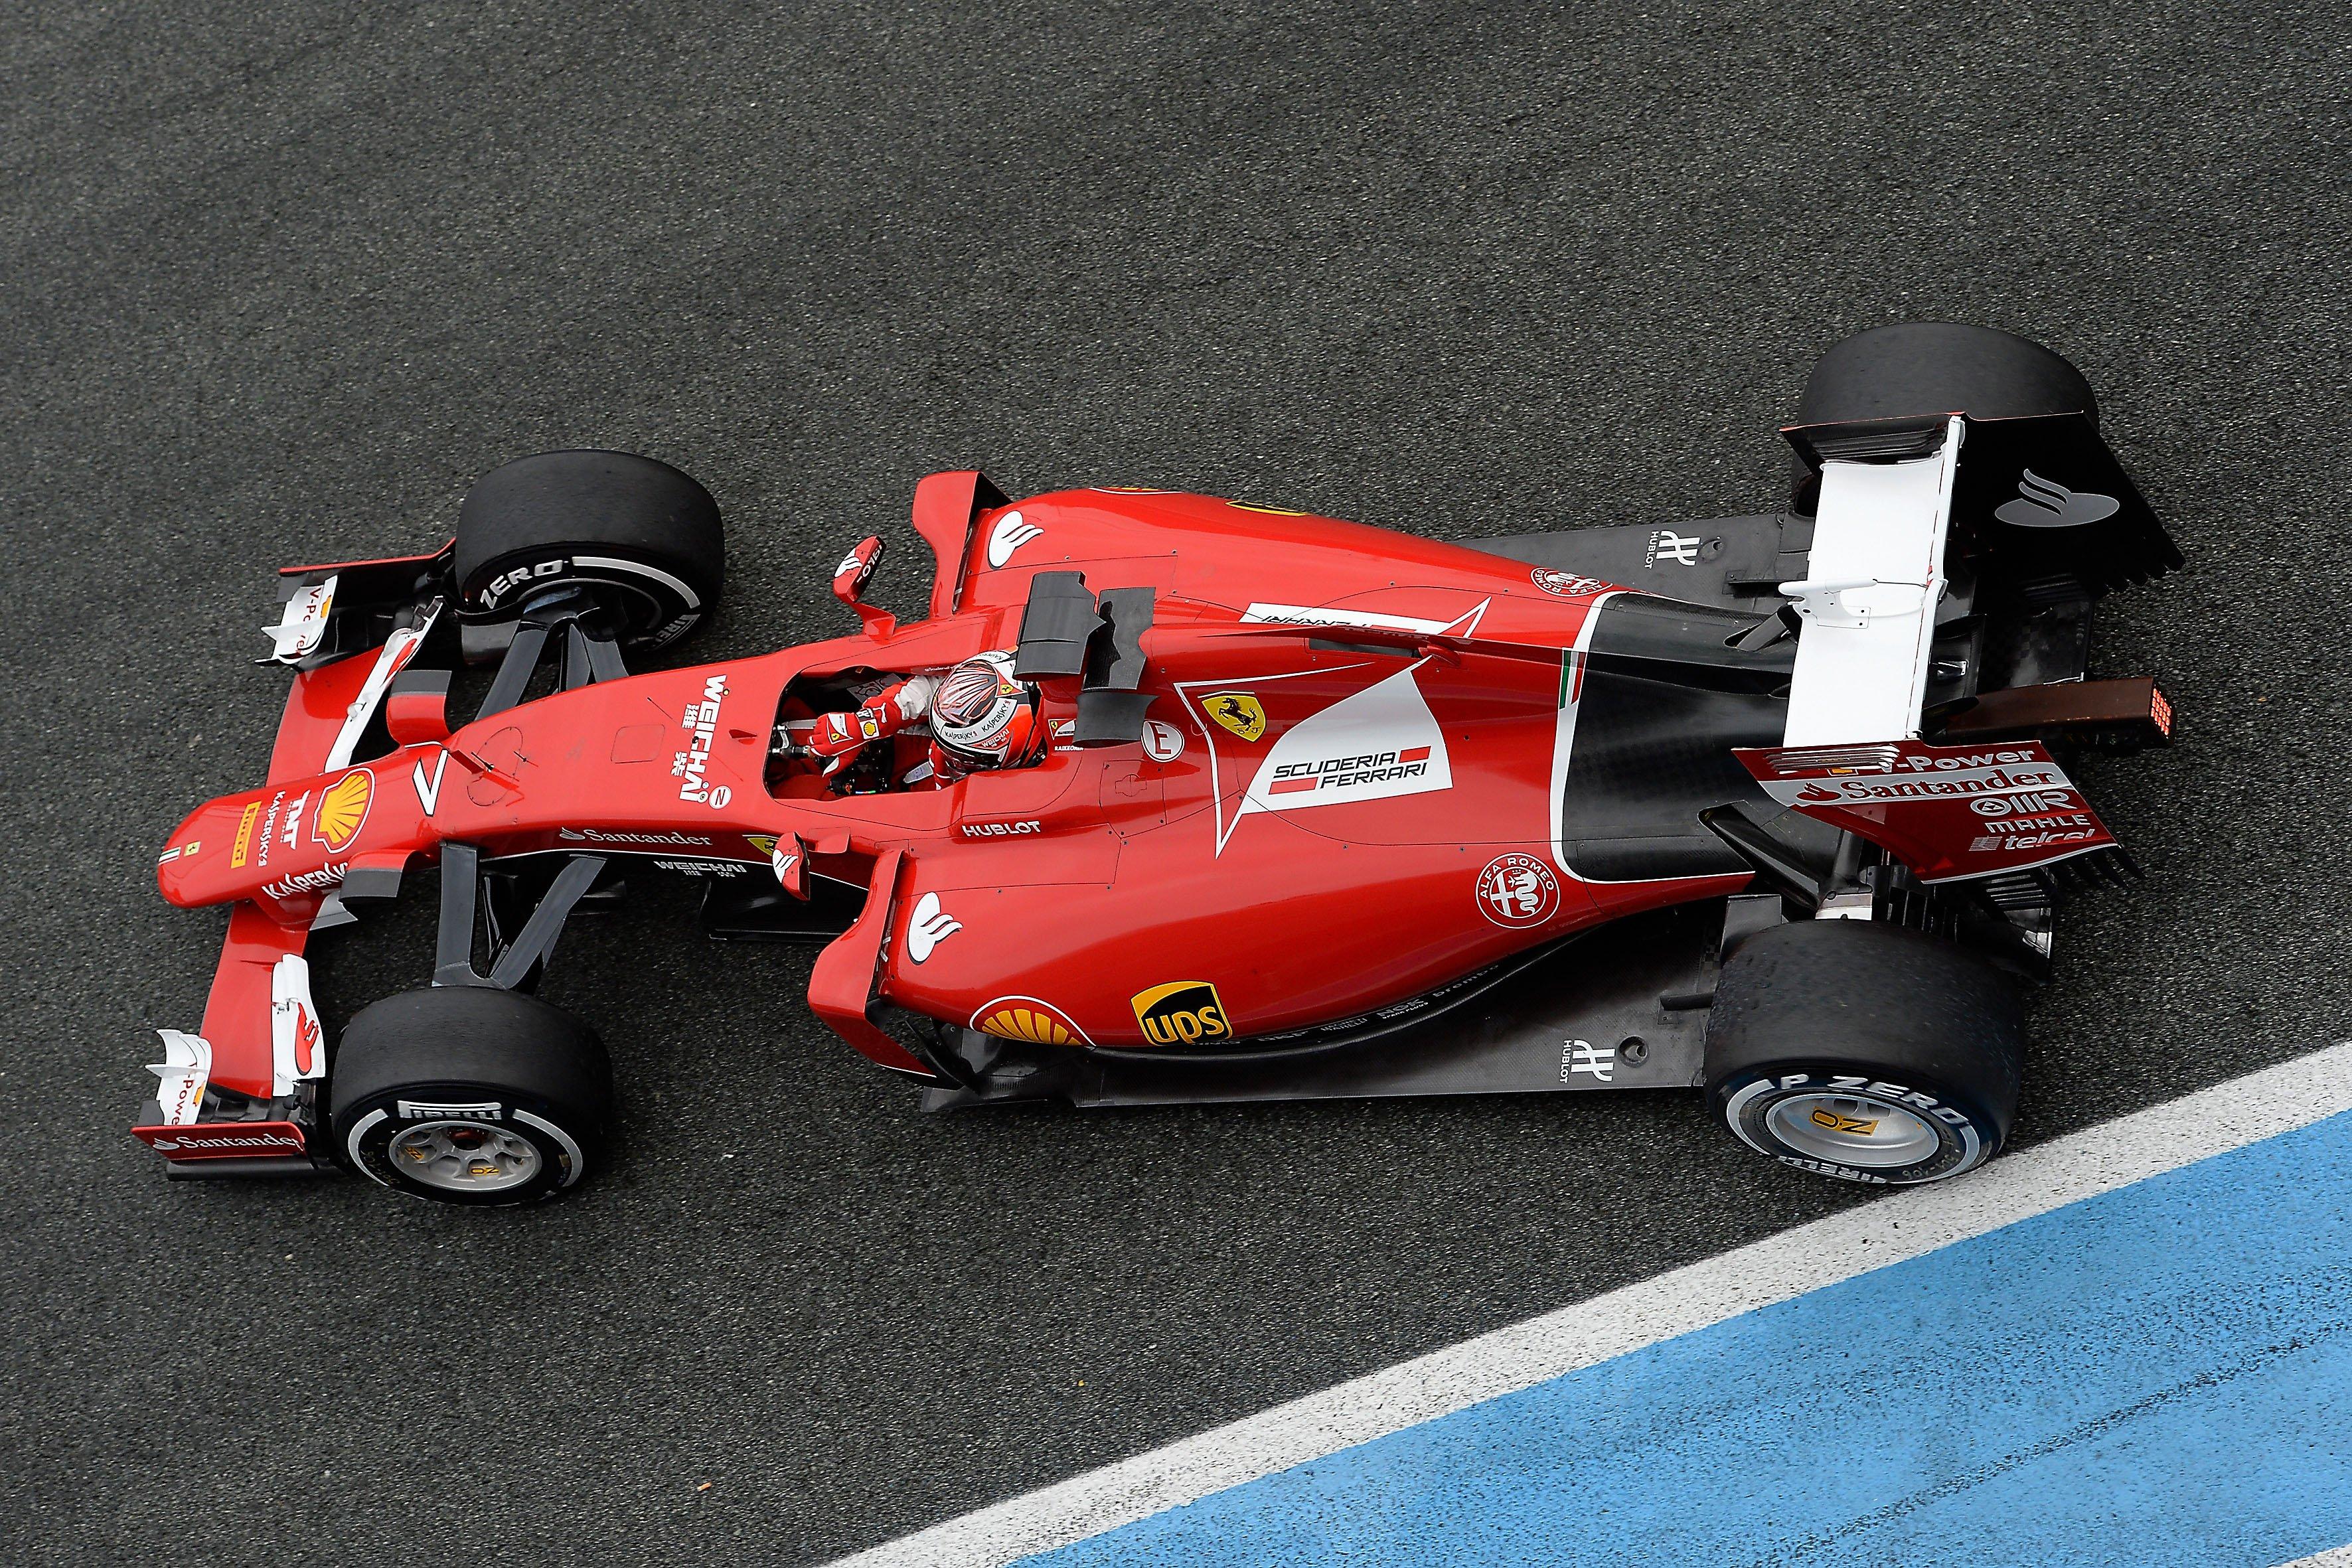 2015 Ferrari Formula one scuderia SF15 T wallpaper background 3543x2362